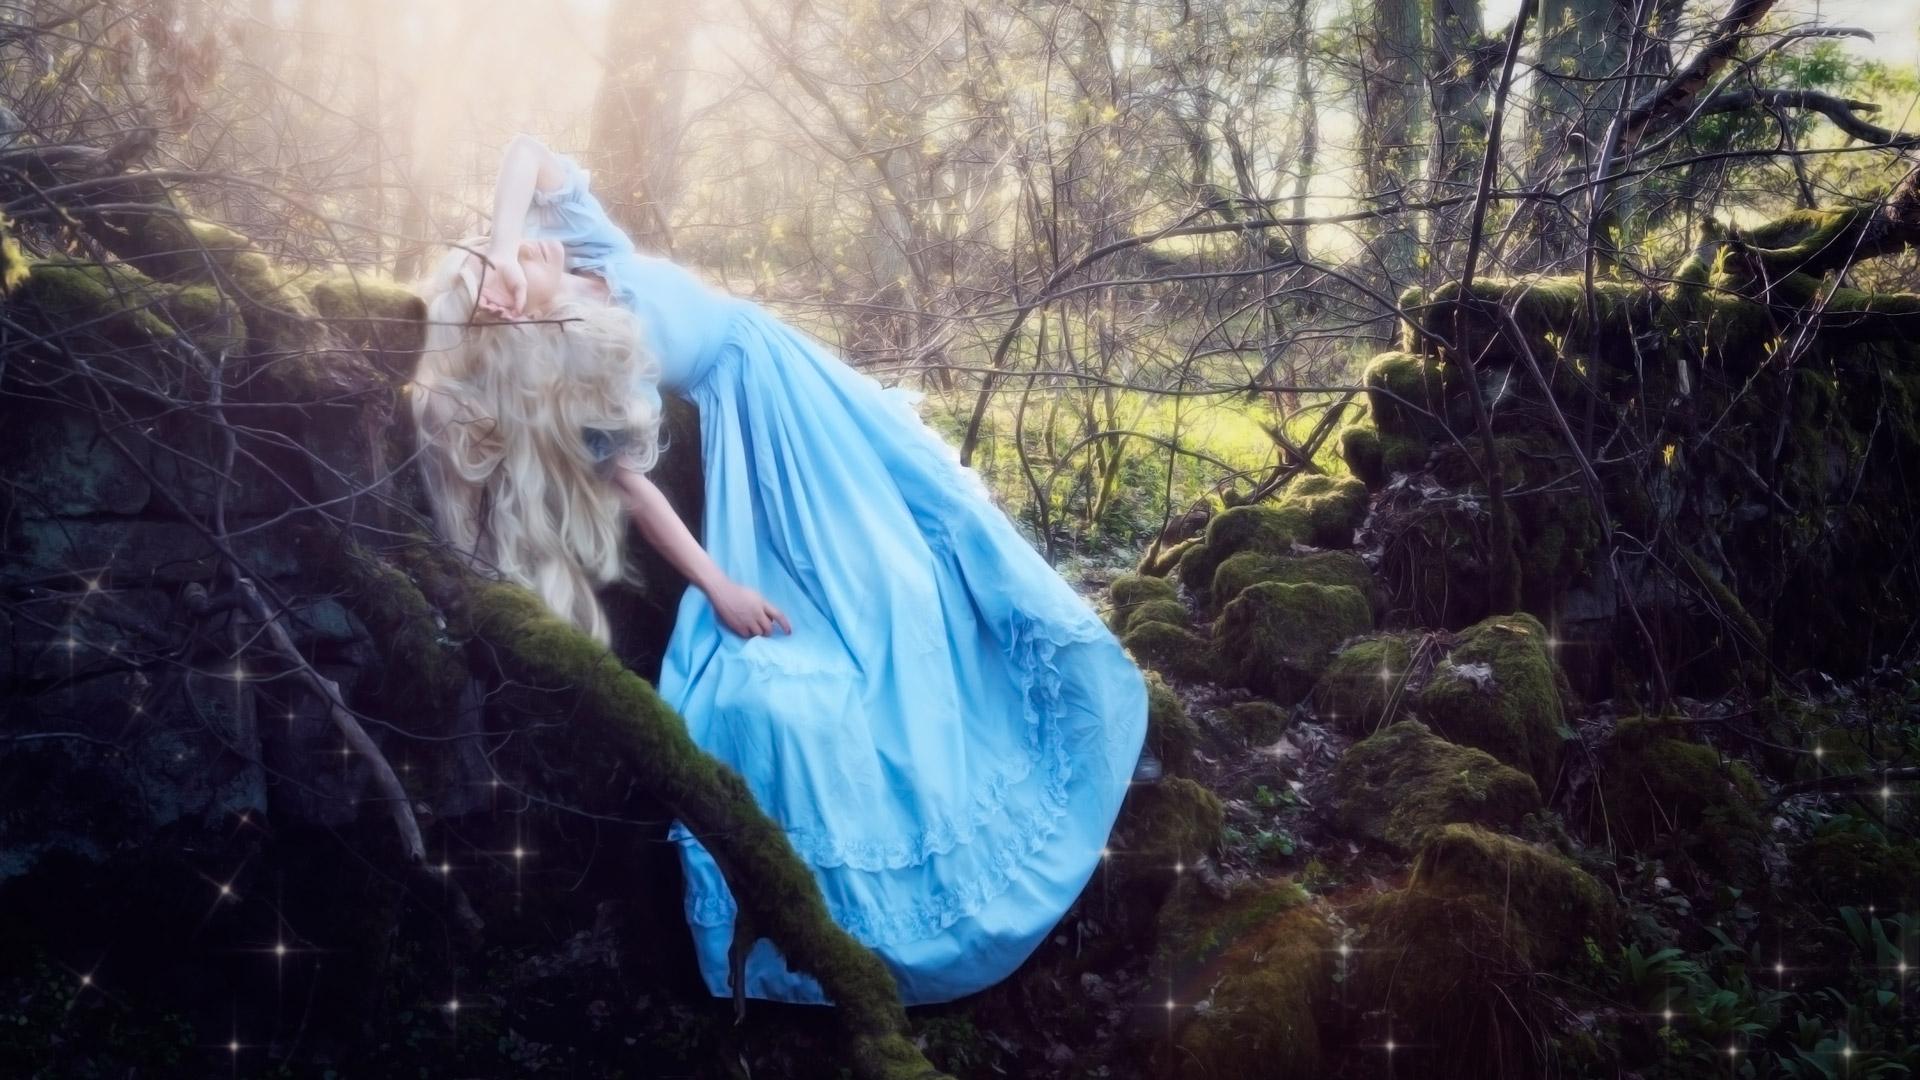 Nicola_Taylor_Dreaming